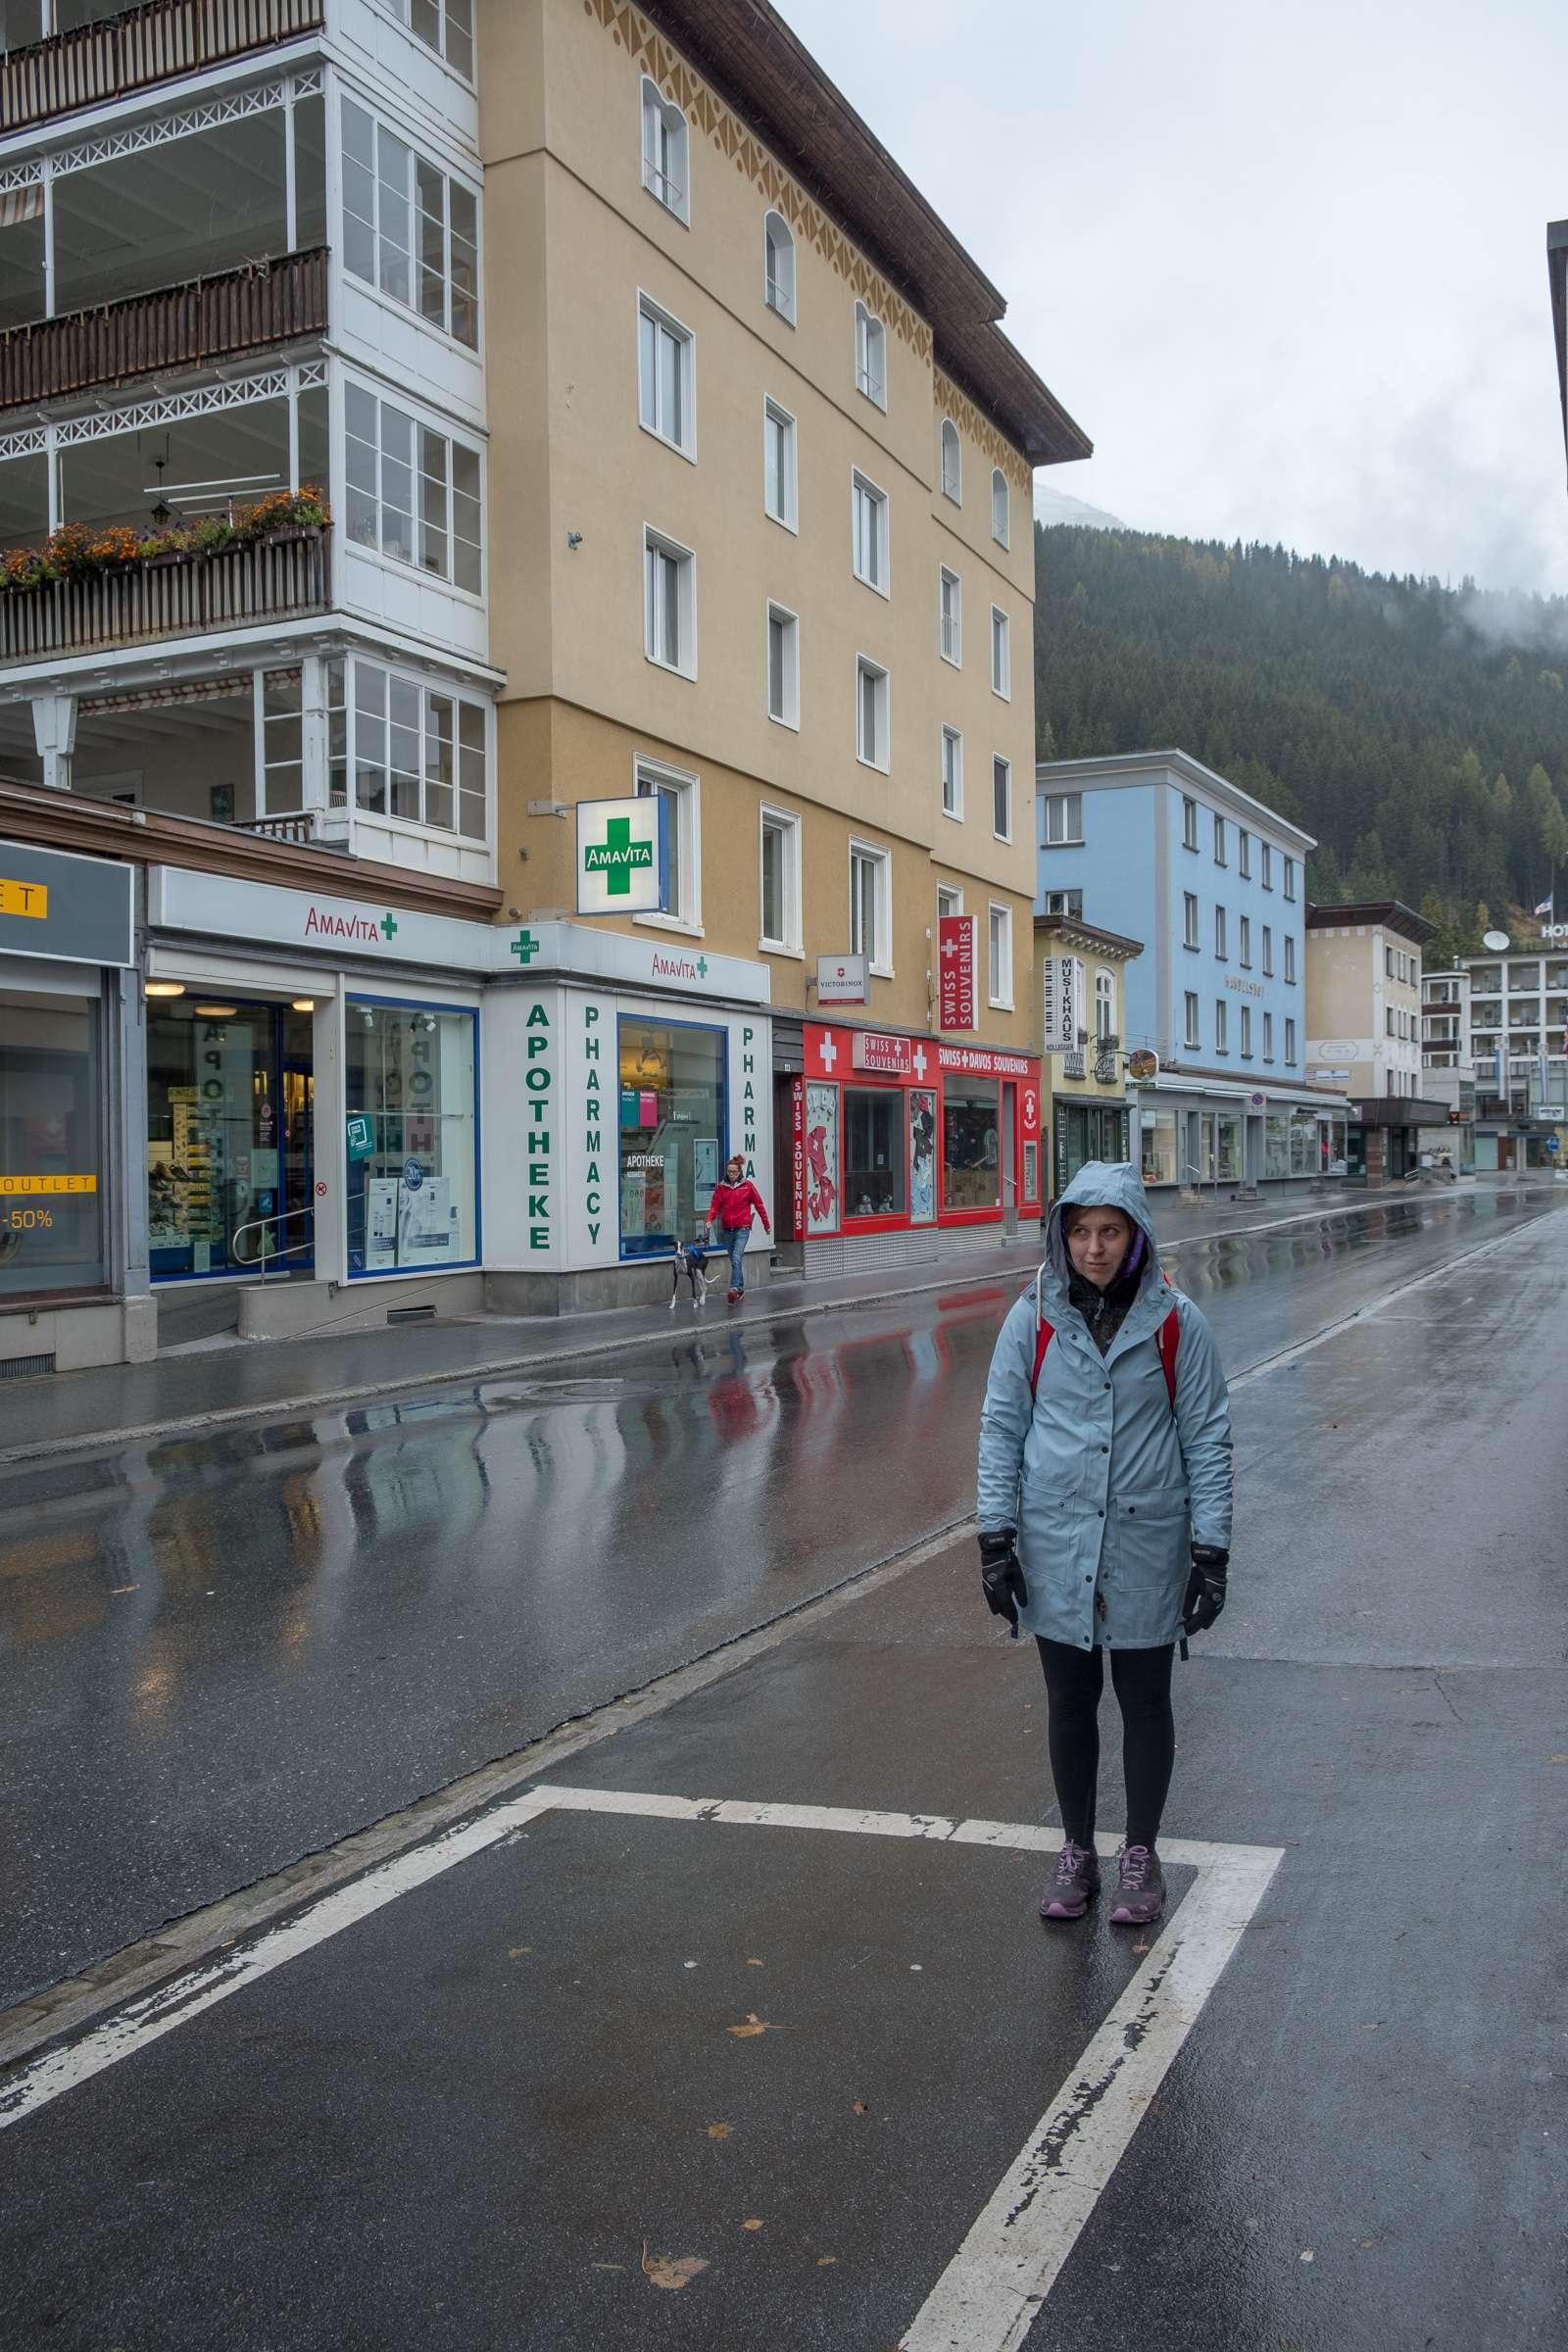 Caroline look glum in wet moody Davos